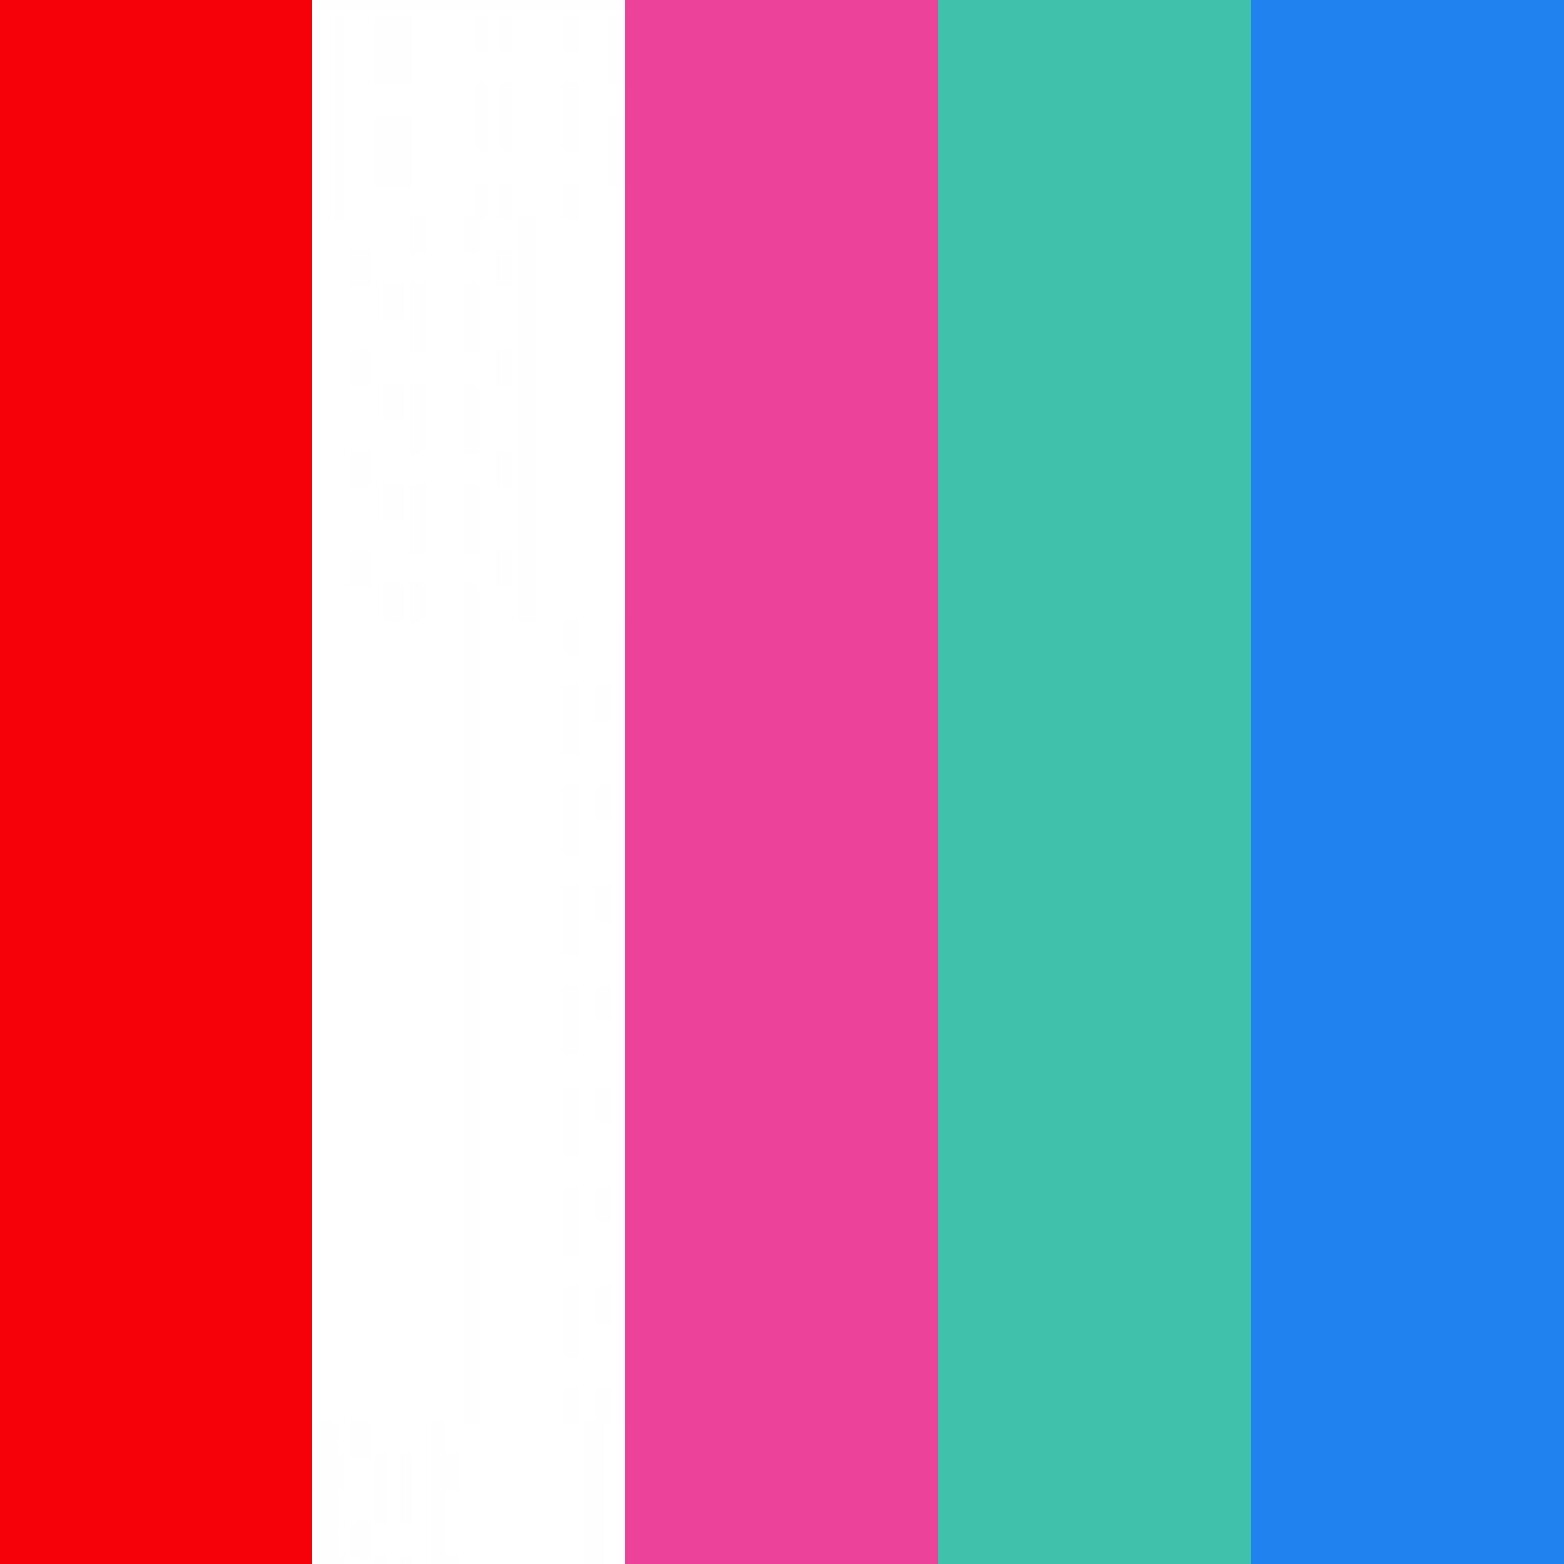 Colours chosen